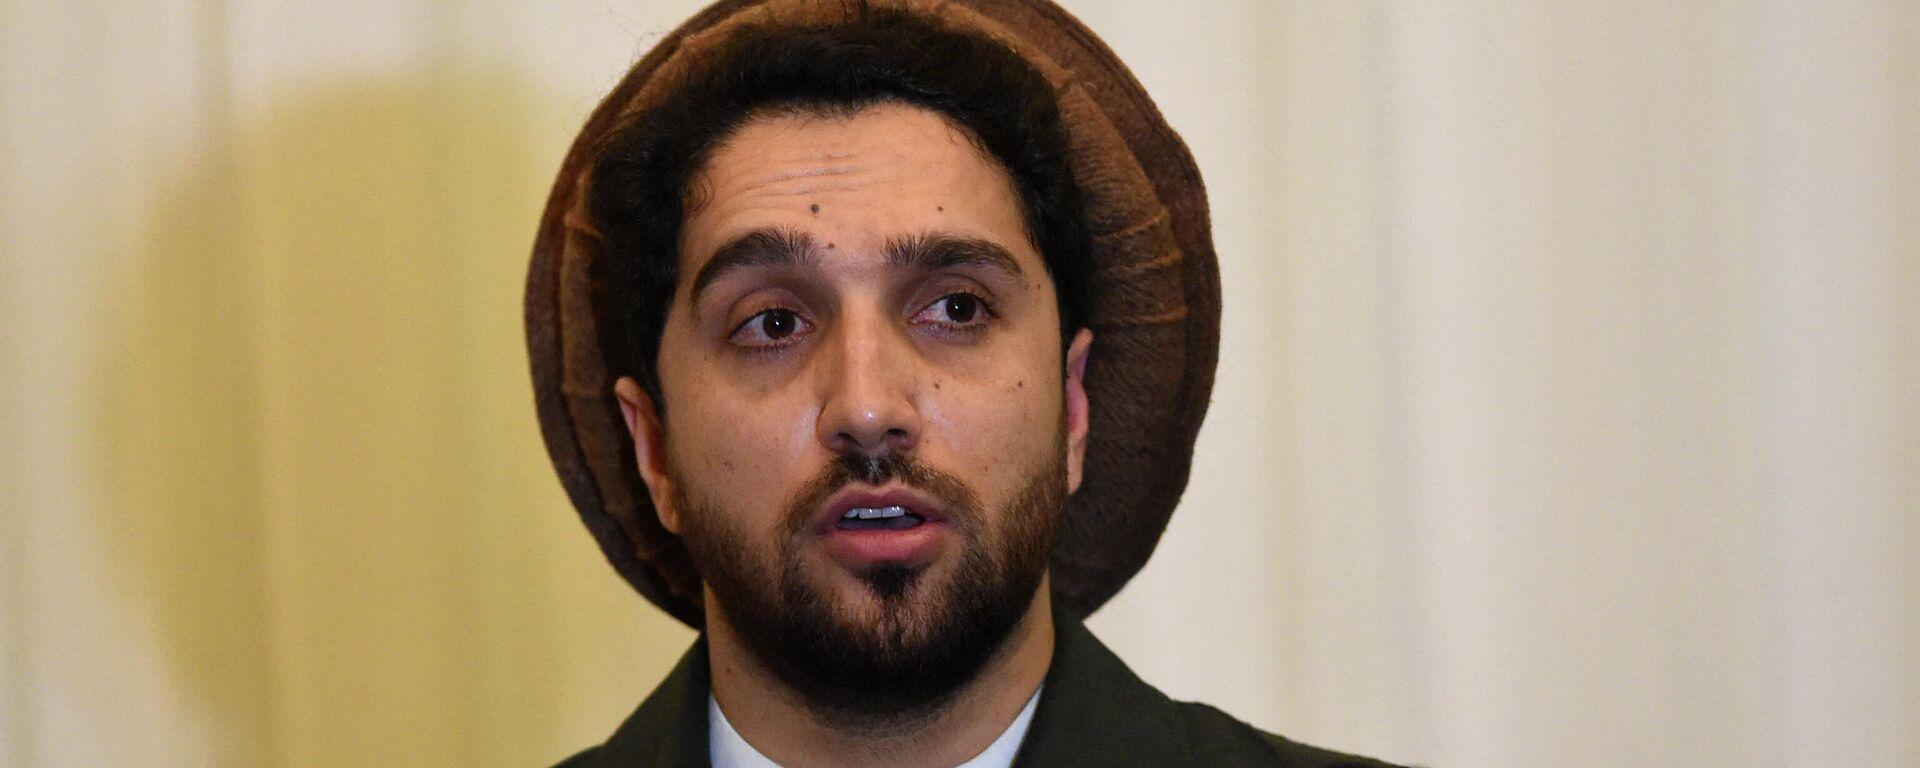 Ахмад Масуд, сын покойного афганского политика и военачальника Ахмад Шаха Масуда - Sputnik Таджикистан, 1920, 02.09.2021